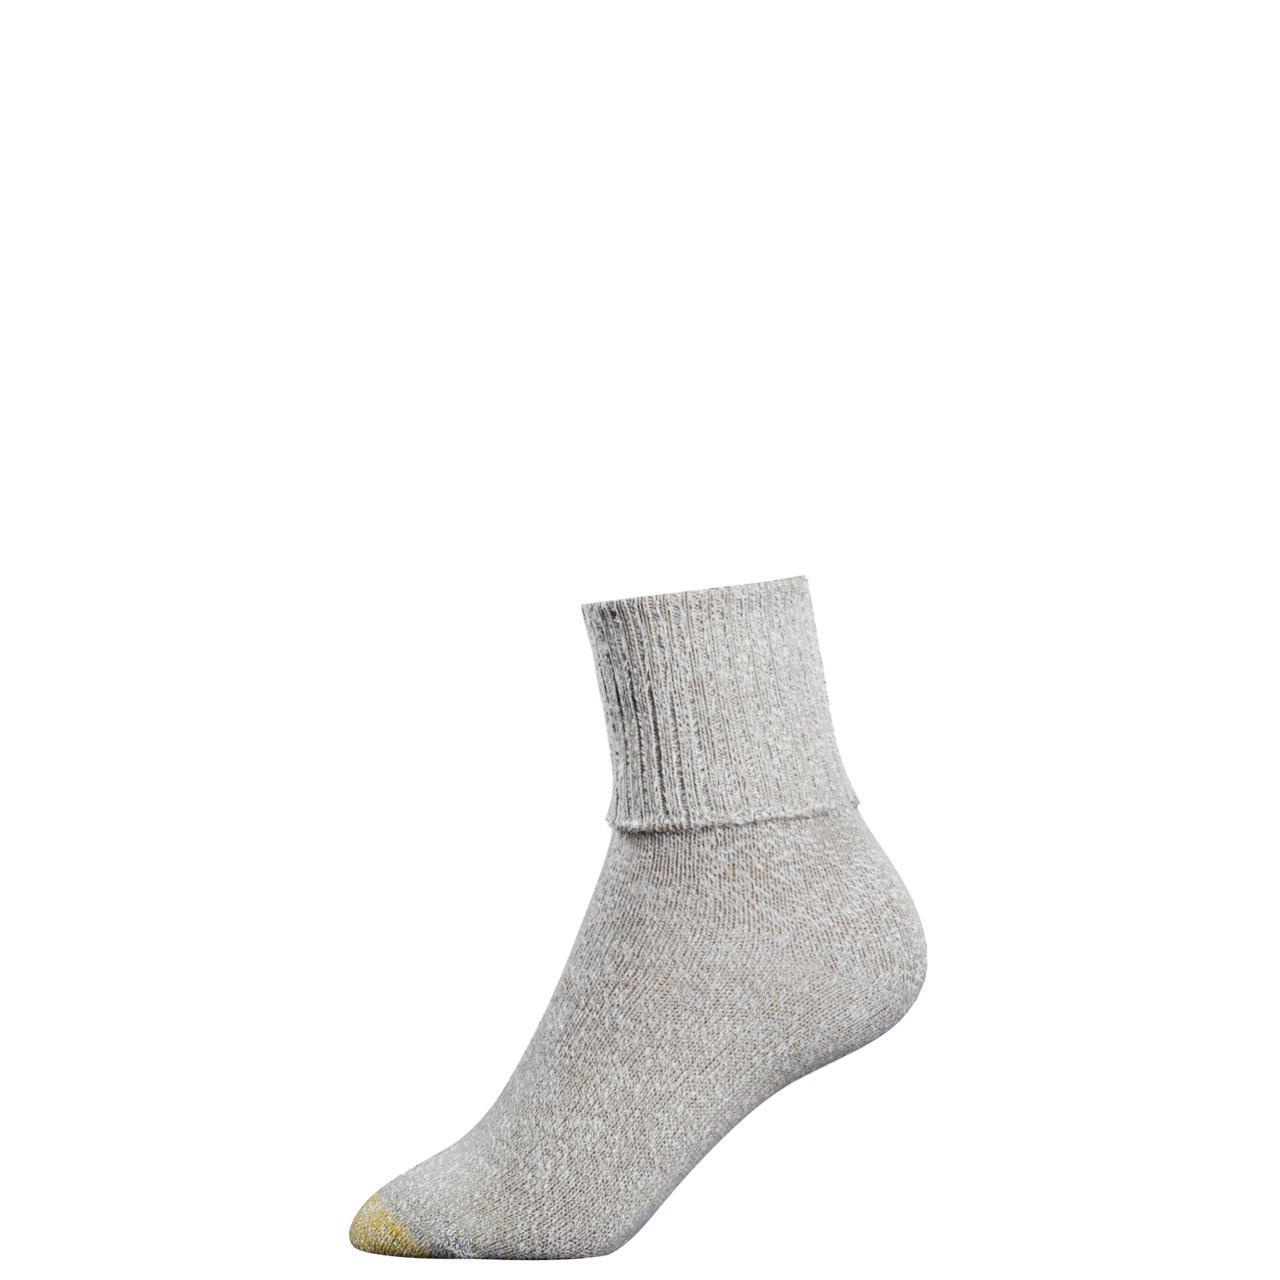 New Gold Toe Women's Cotton Turn Cuff Ankle Socks | eBay